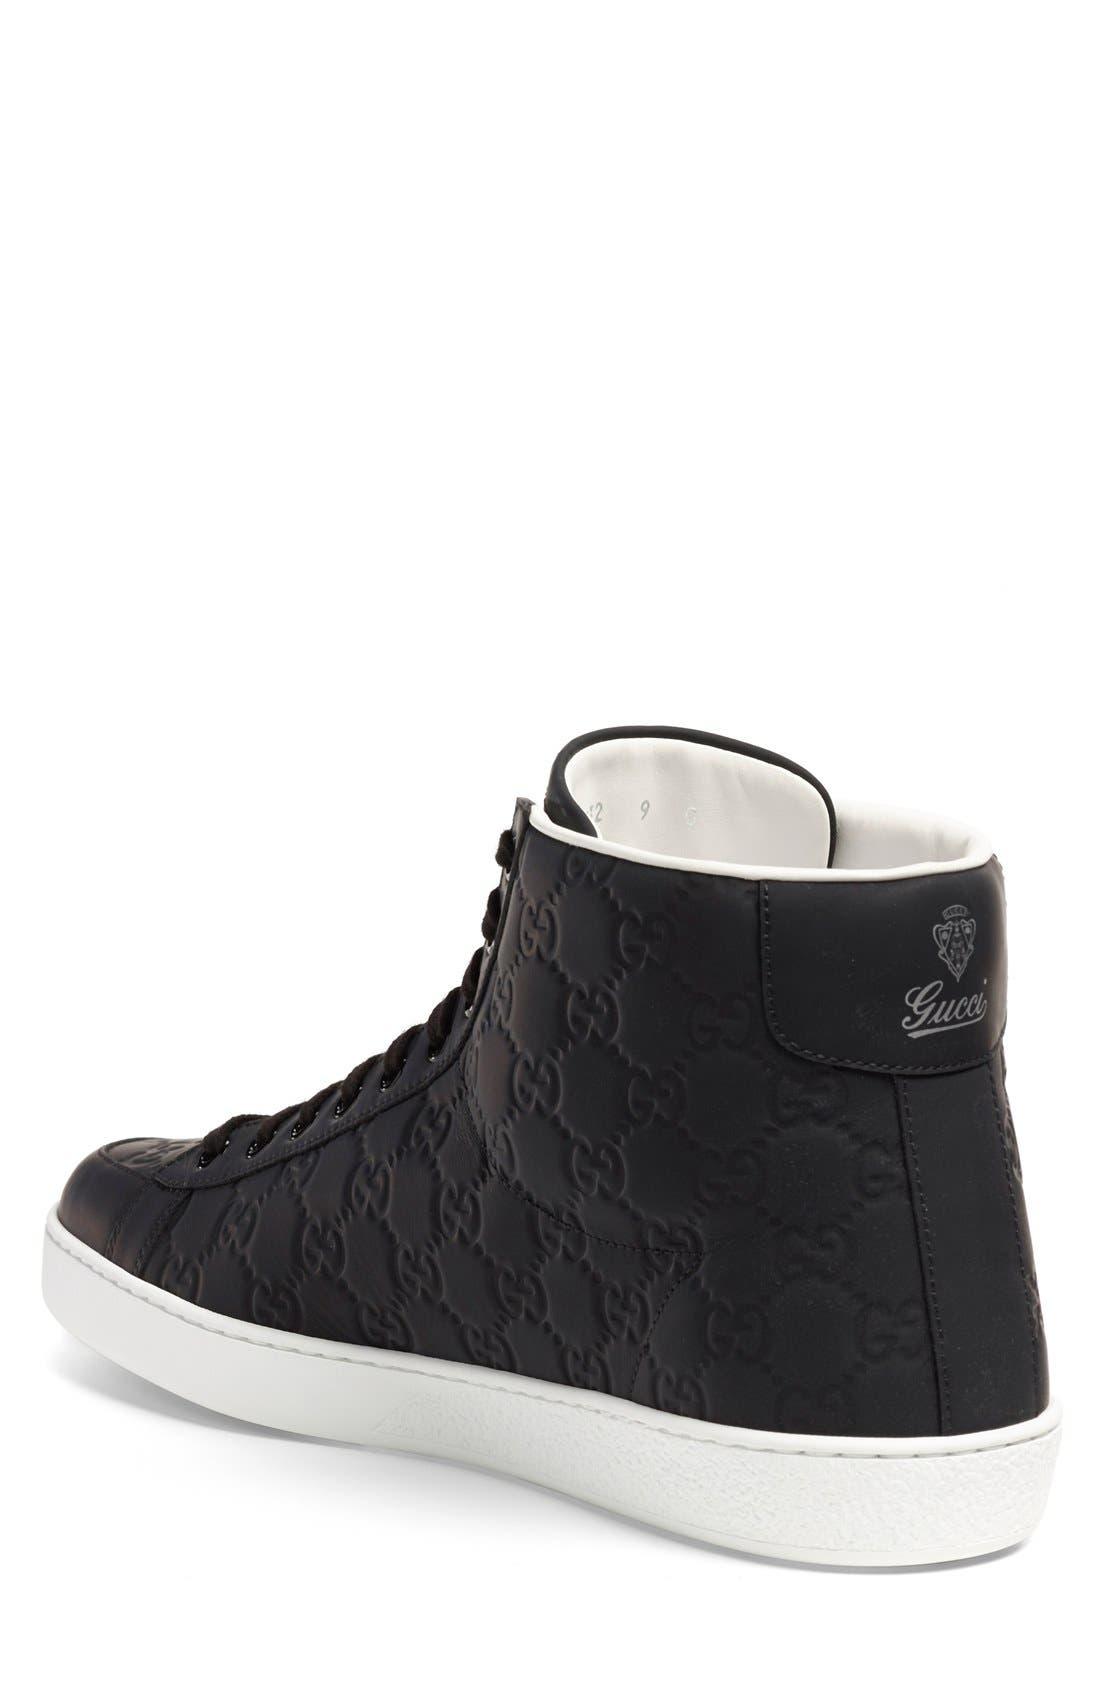 'Brooklyn' High-Top Sneaker,                             Alternate thumbnail 4, color,                             001